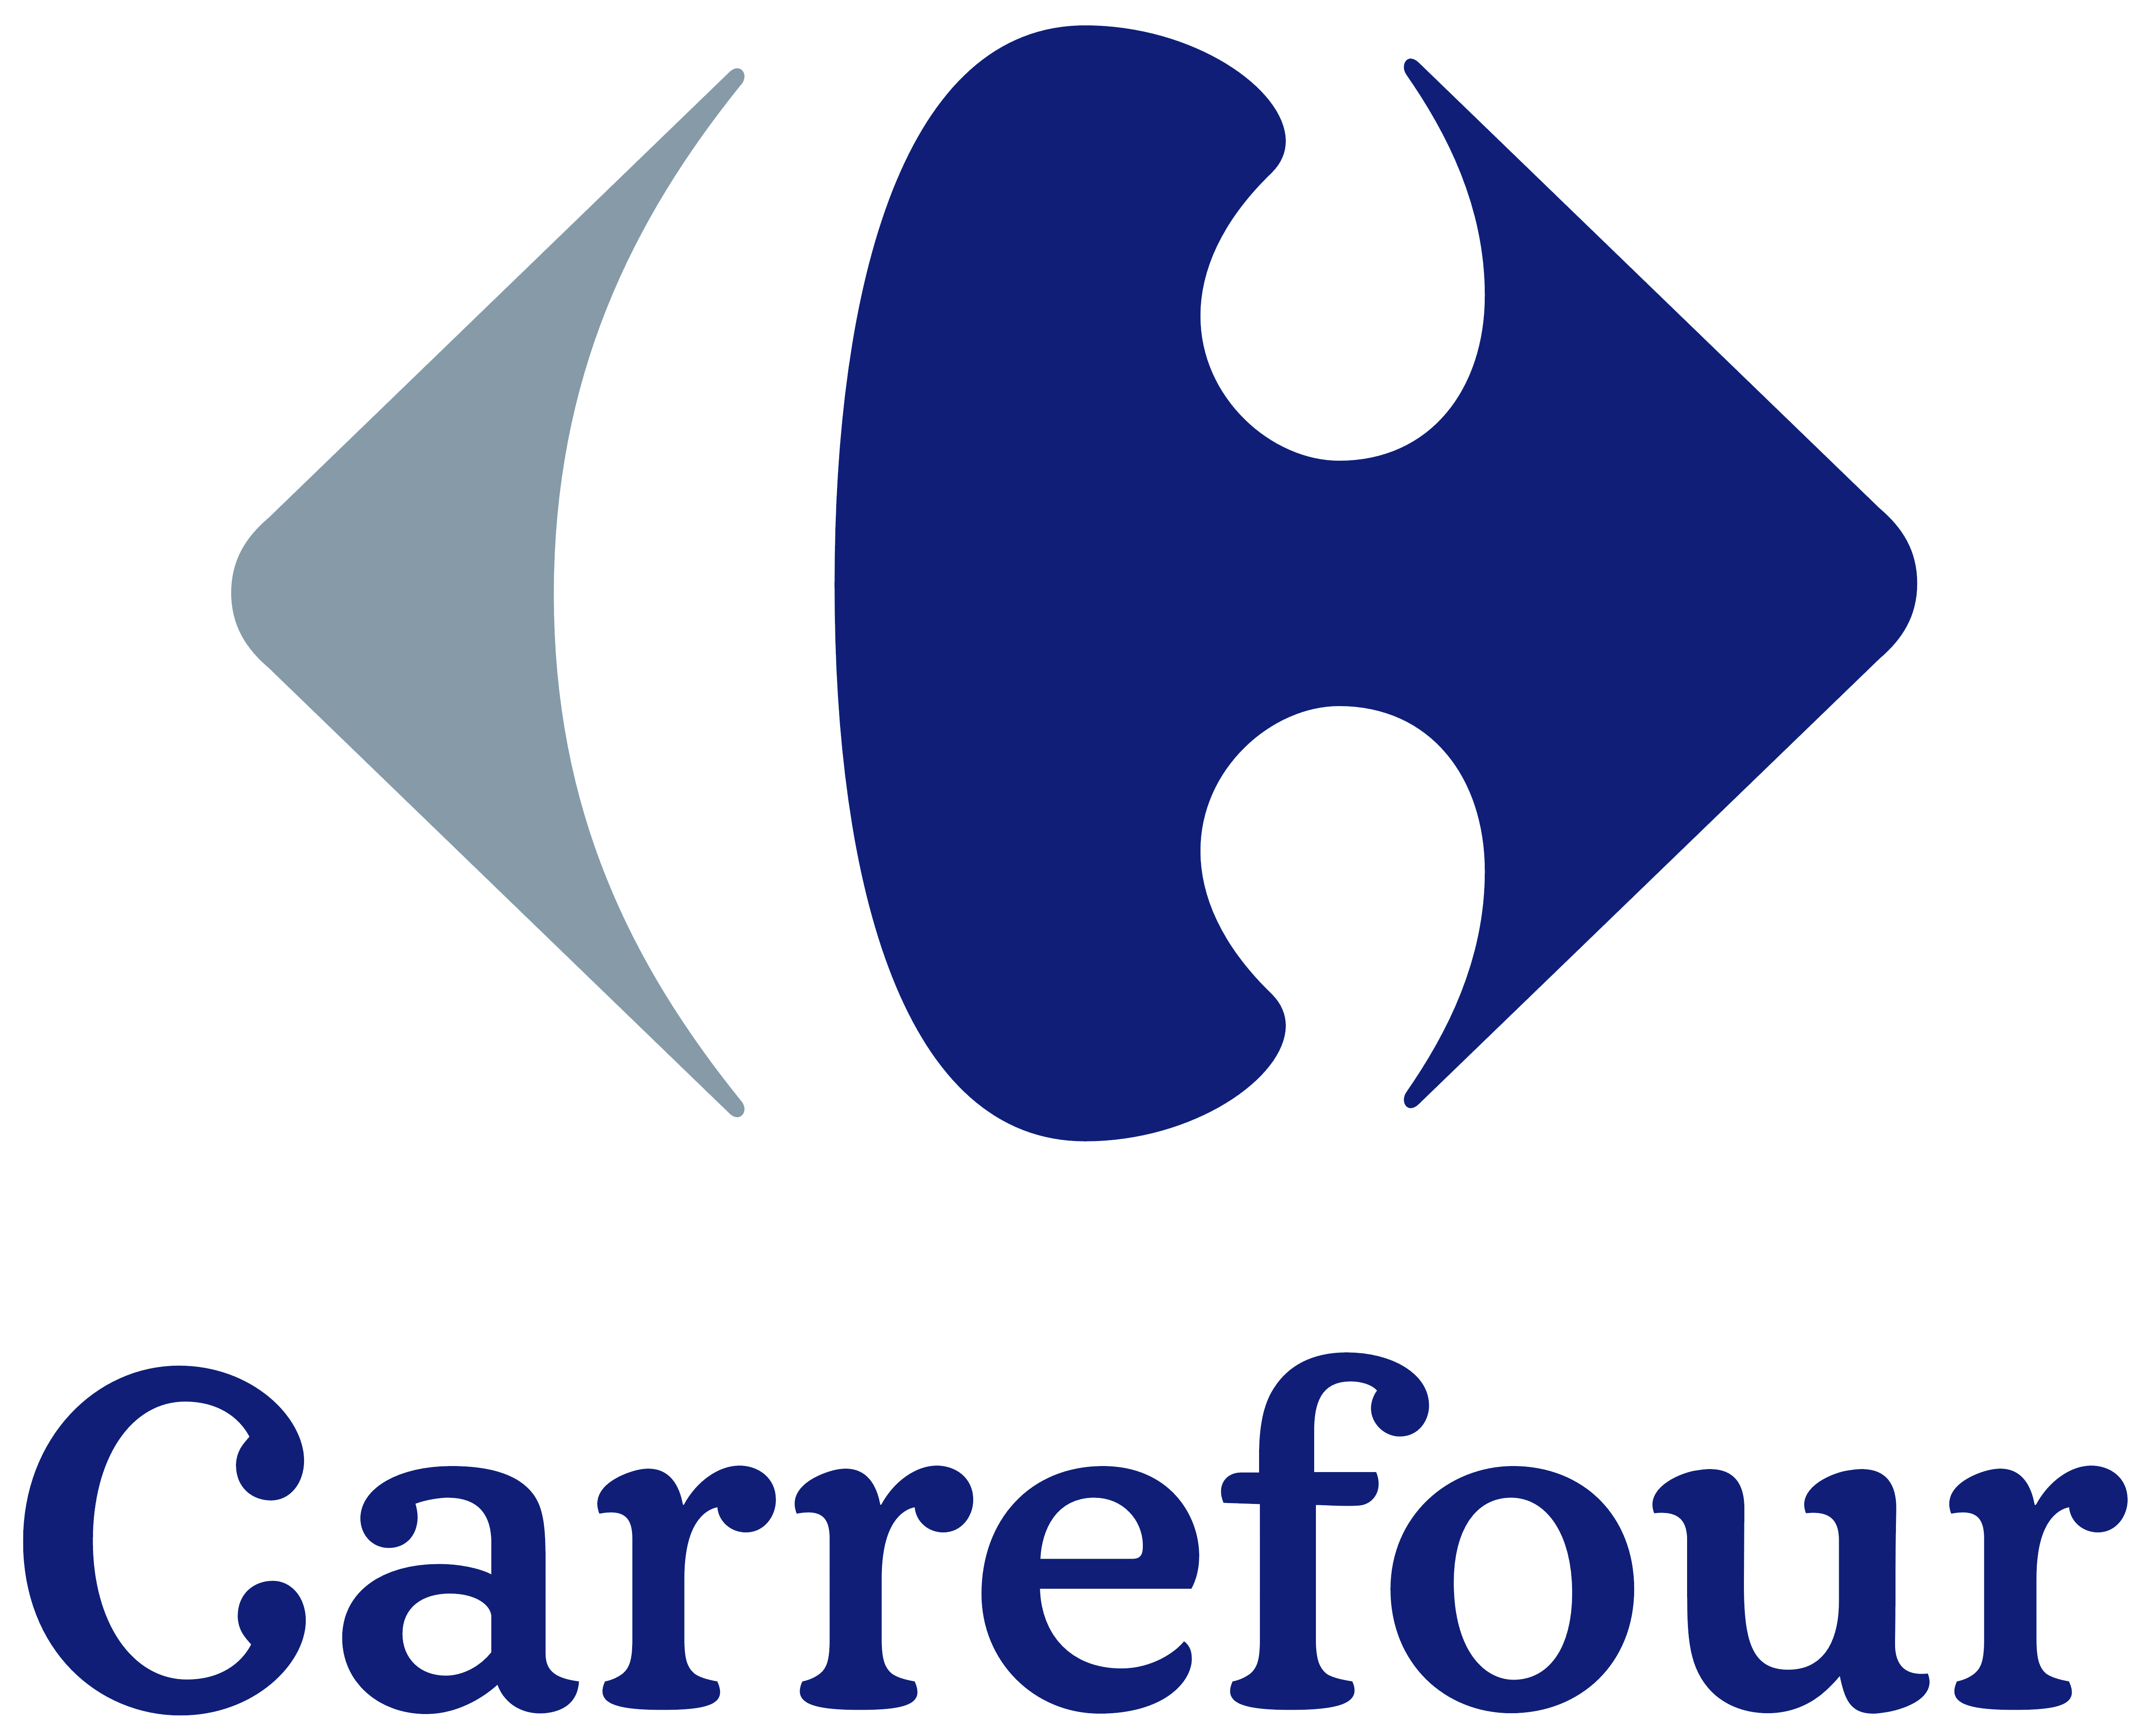 Carrefour – Logos Download